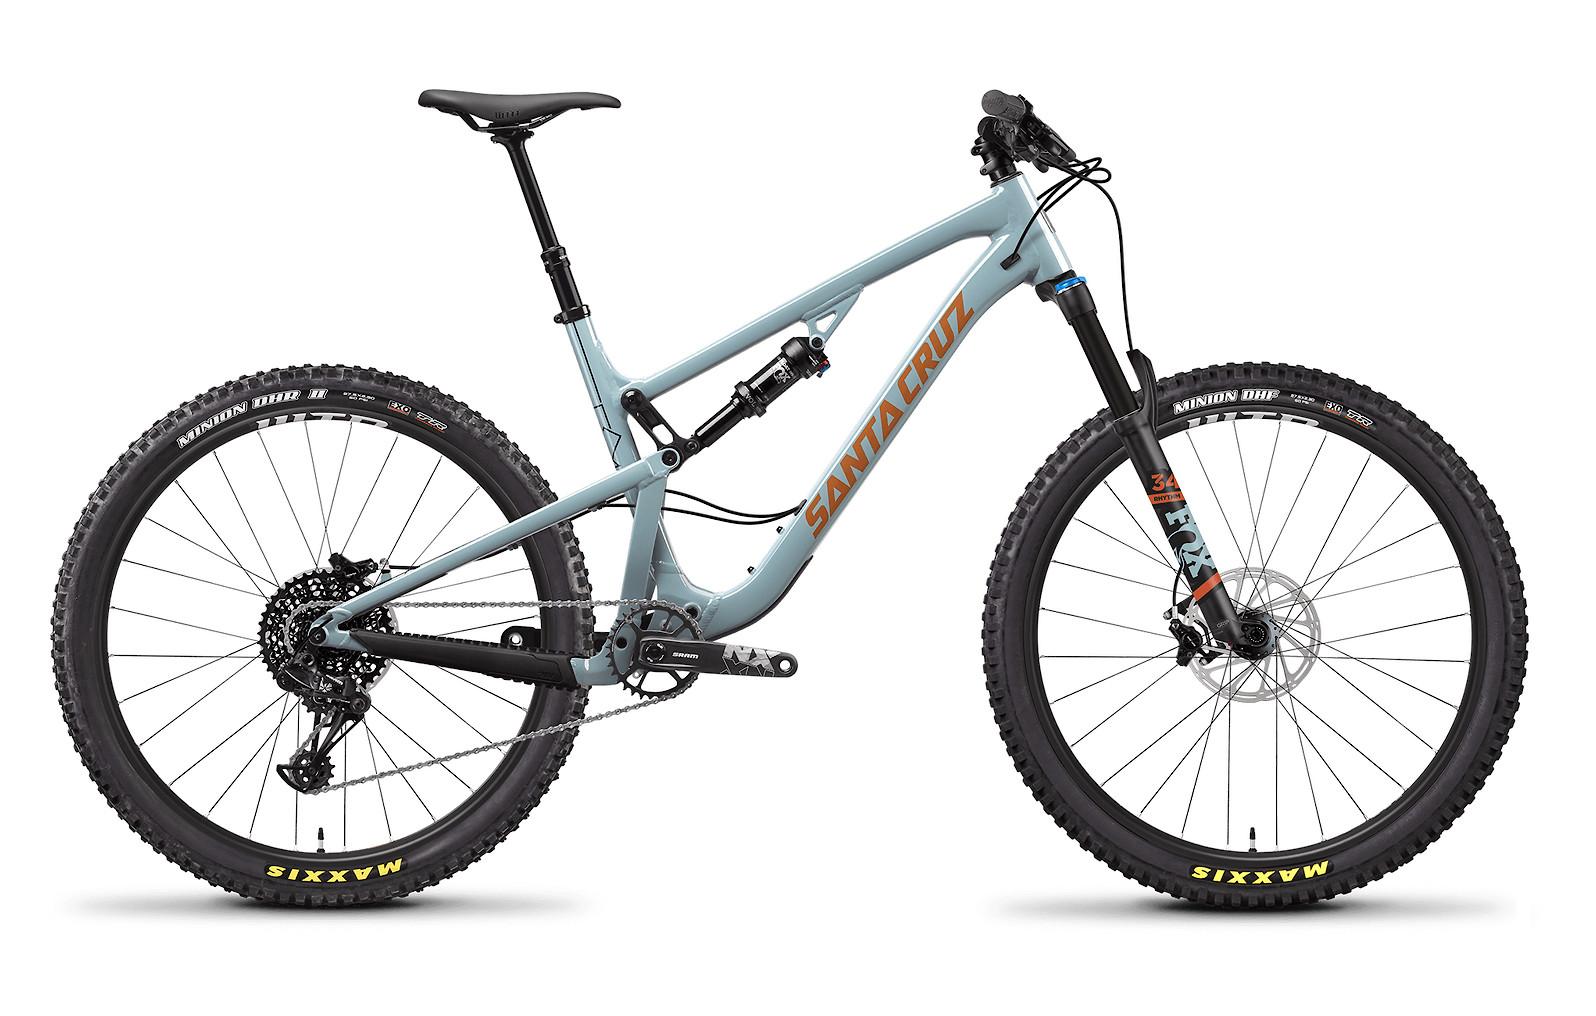 2020 Santa Cruz 5010 Aluminum R (Regular Build, Robins Egg and Orange)